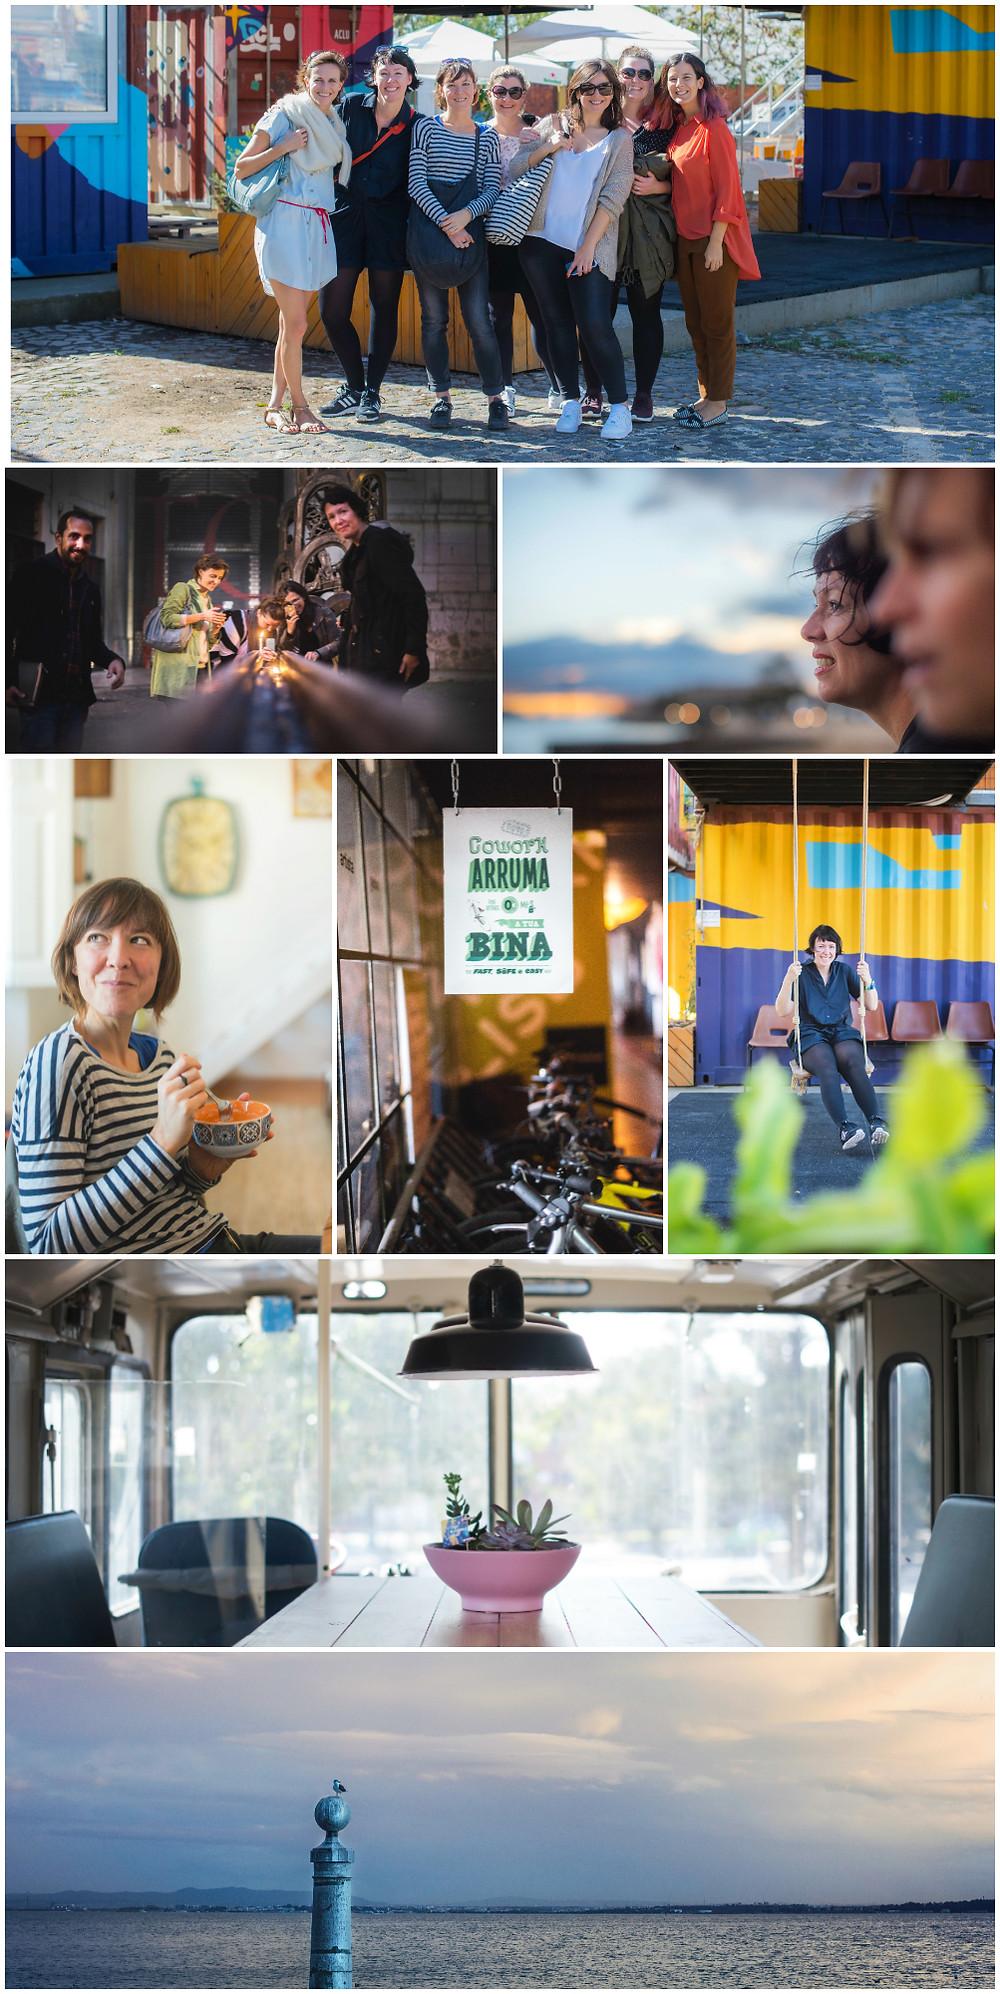 LikeBirds Inspirationtrip Lisboa (c) Silvie Bonne